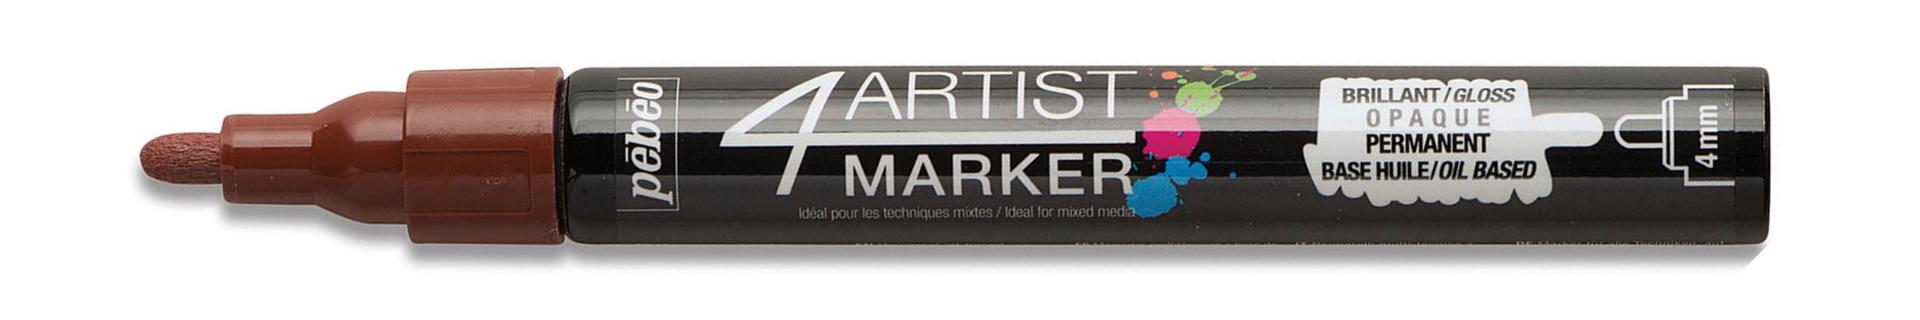 Pebeo 4Artist Marker